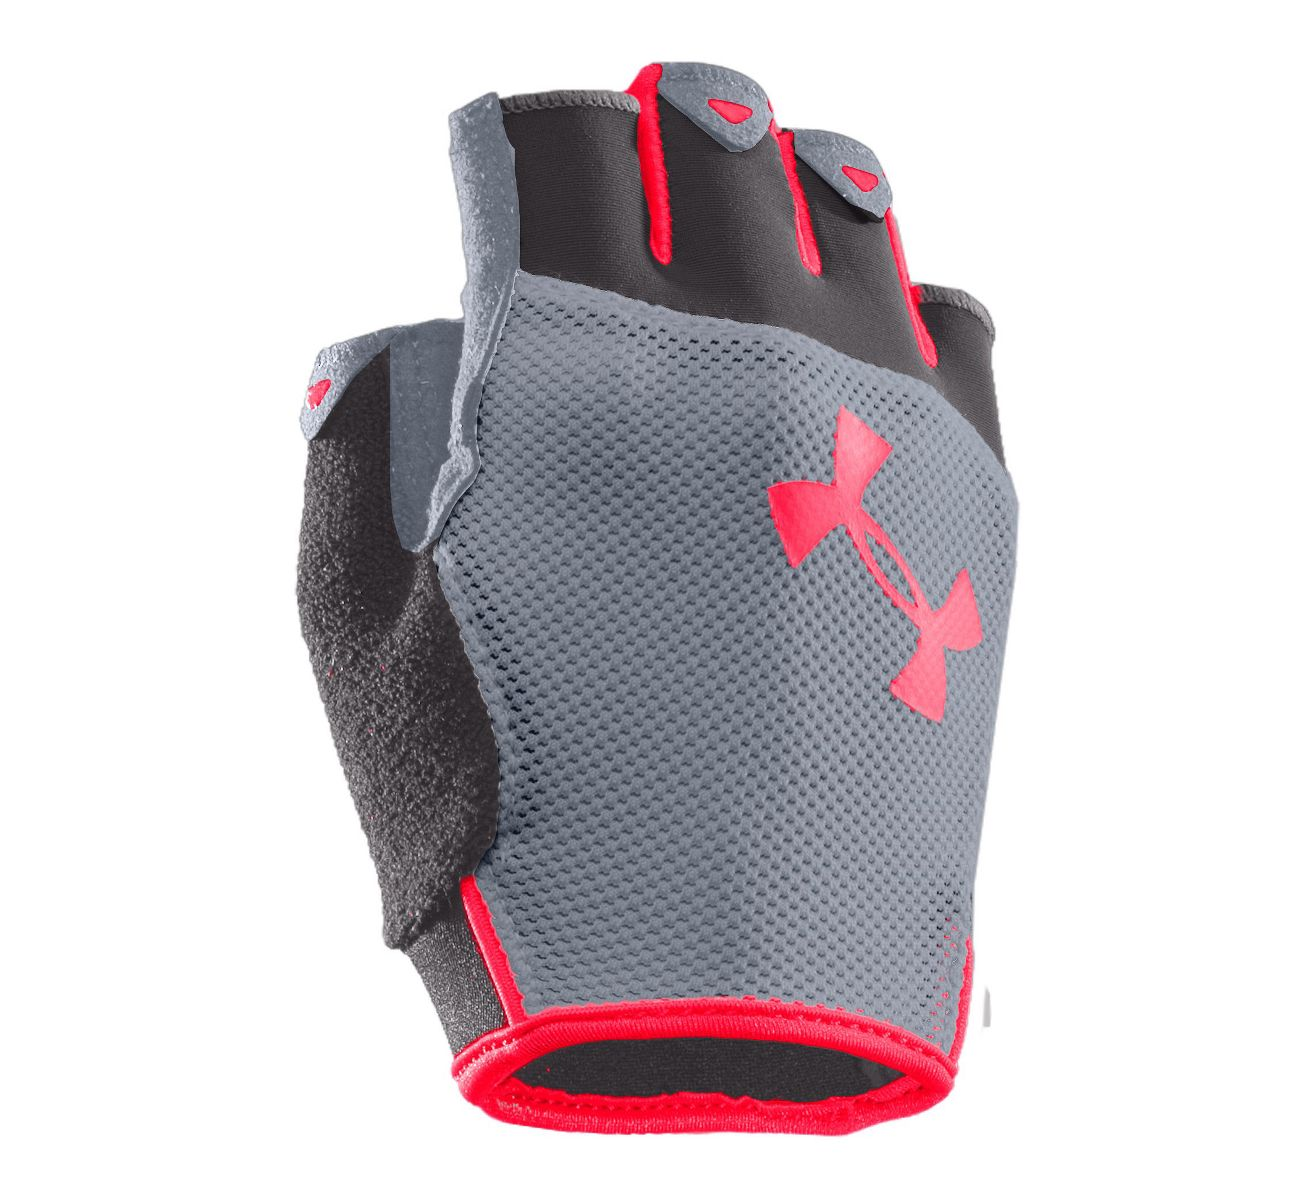 Under Armour Crossfit Gloves: Under Armour Women's CTR Trainer Half Finger Gloves